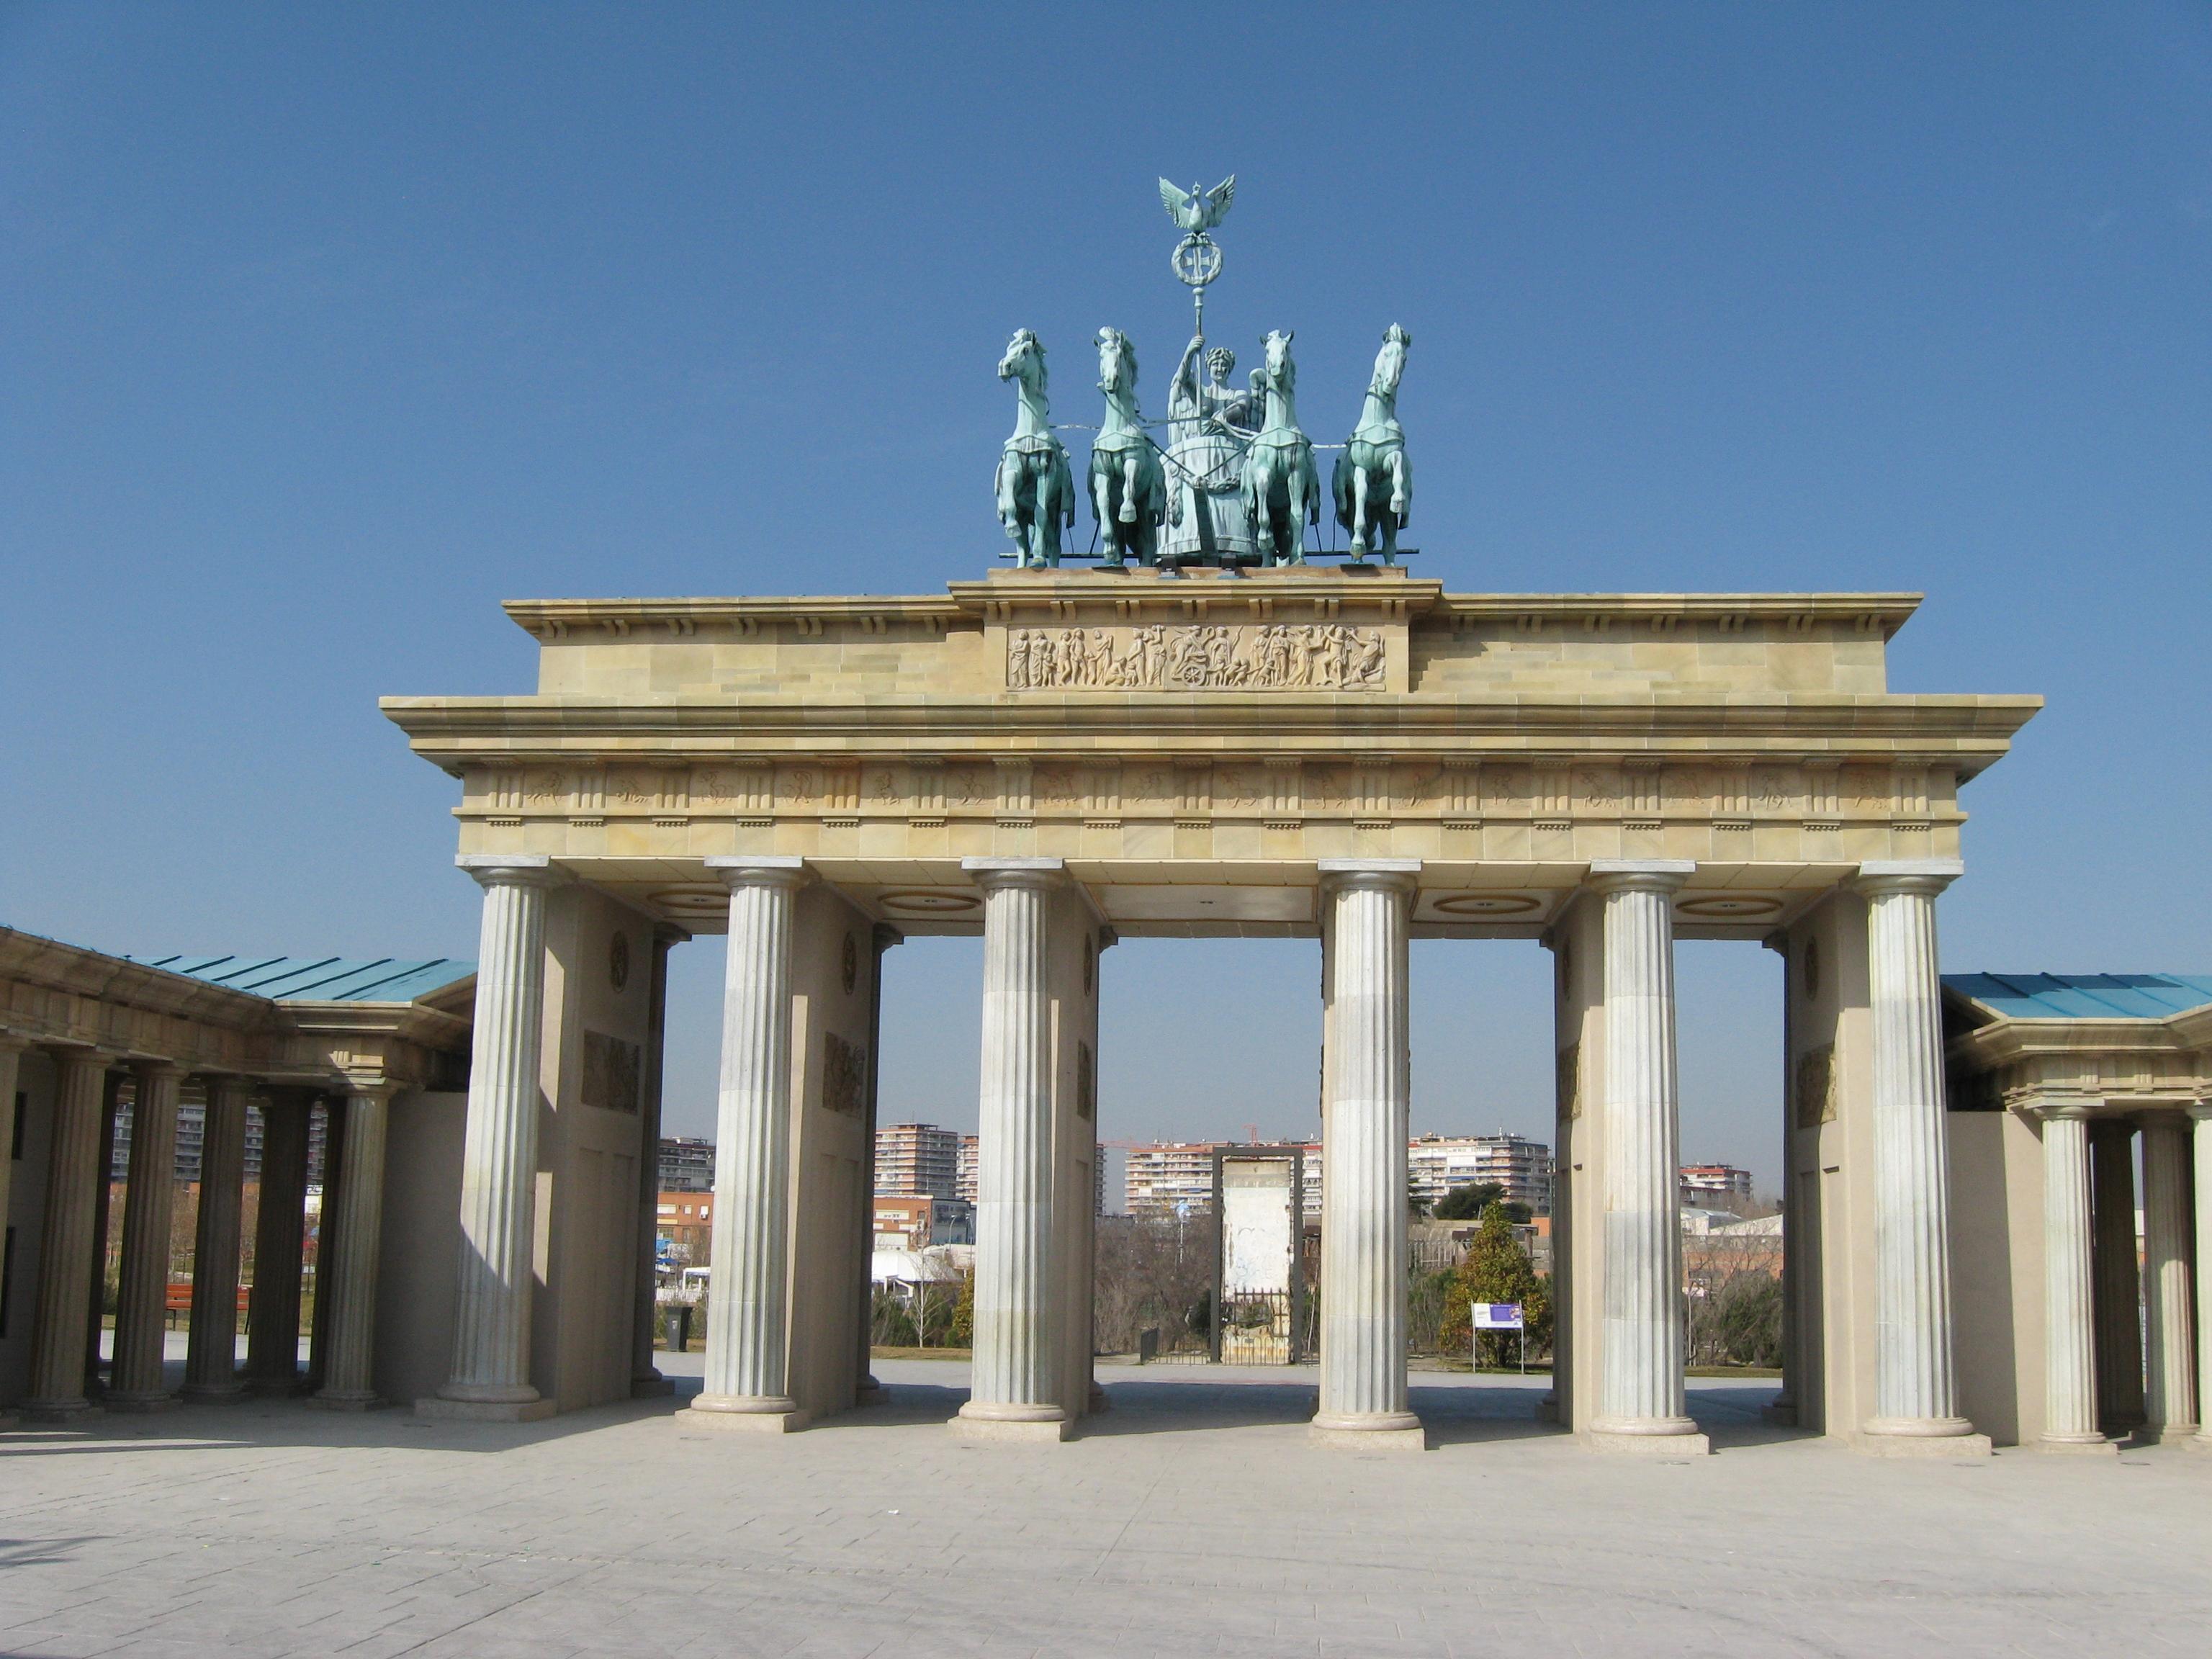 Puerta_de_Brandenburgo,_Parque_de_Europa,_Torrejón